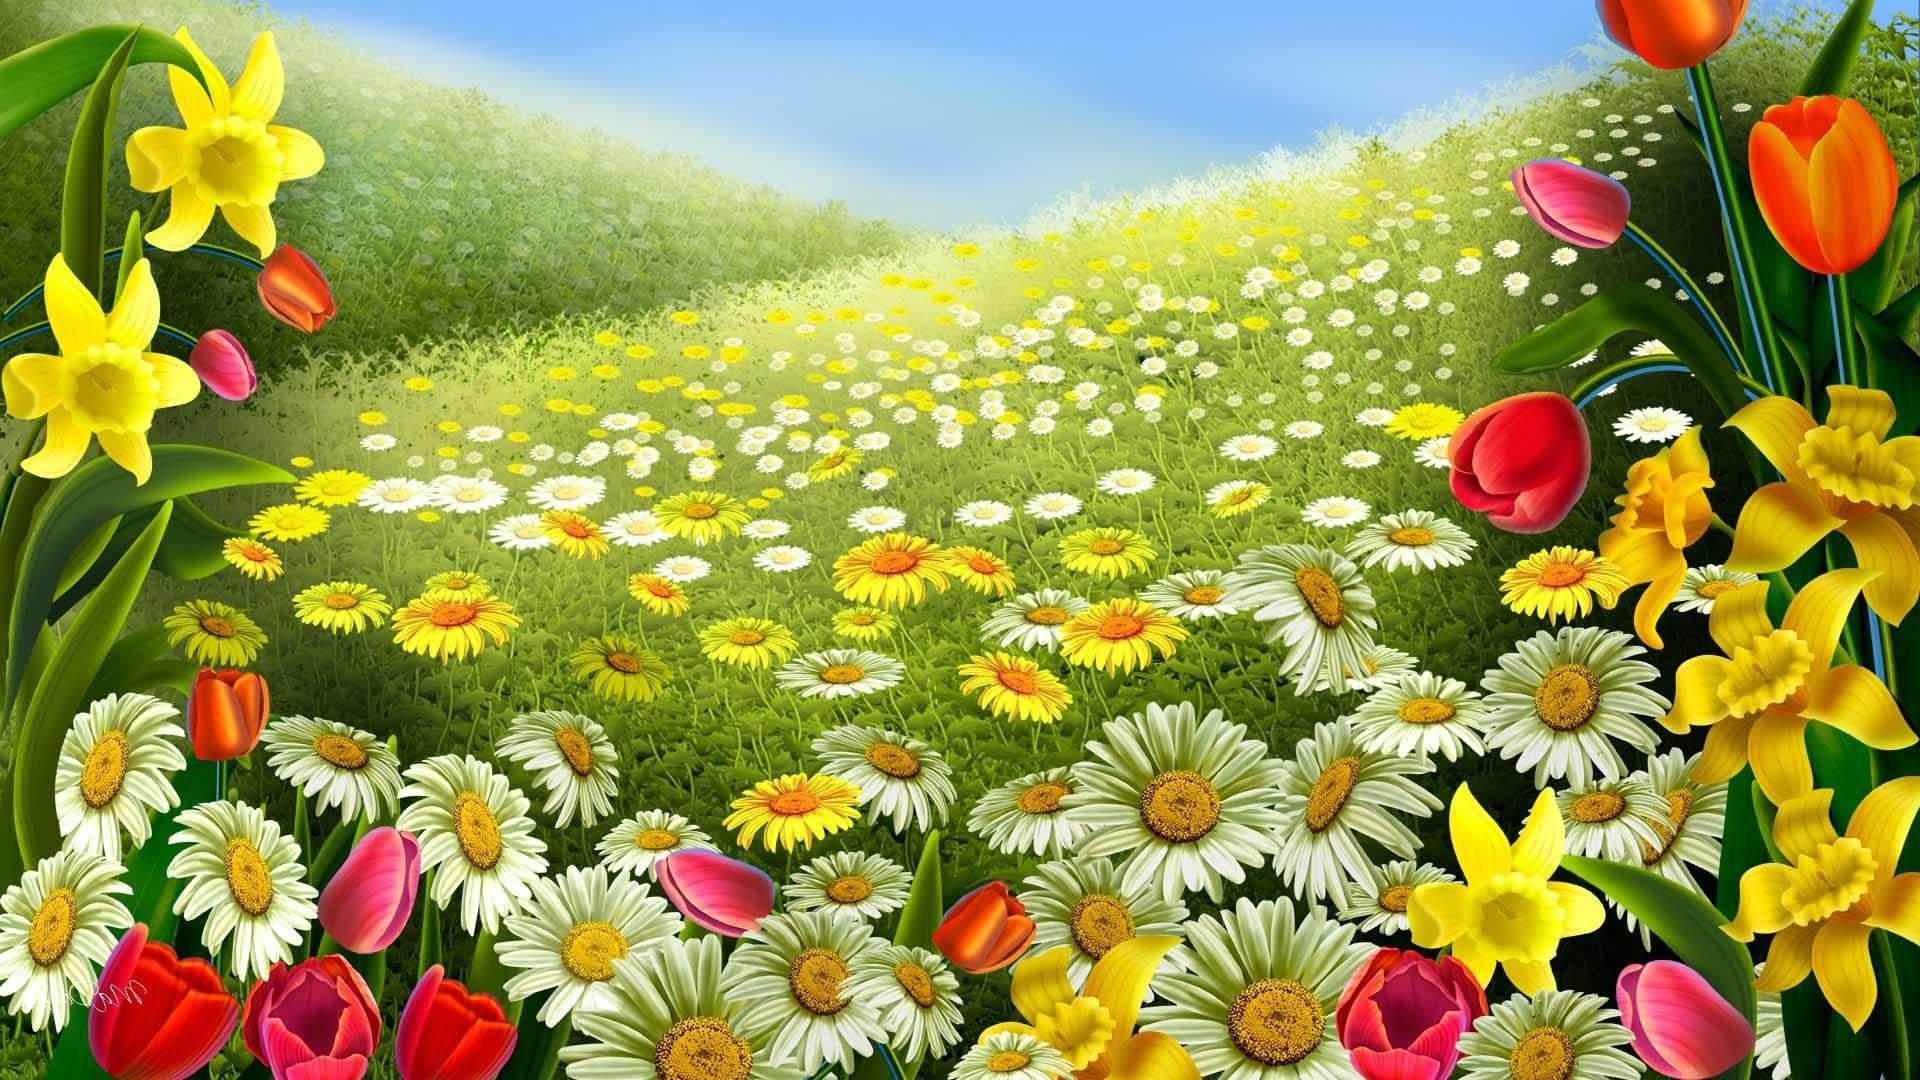 Res: 1920x1080, Spring Desktop Backgrounds wallpaper